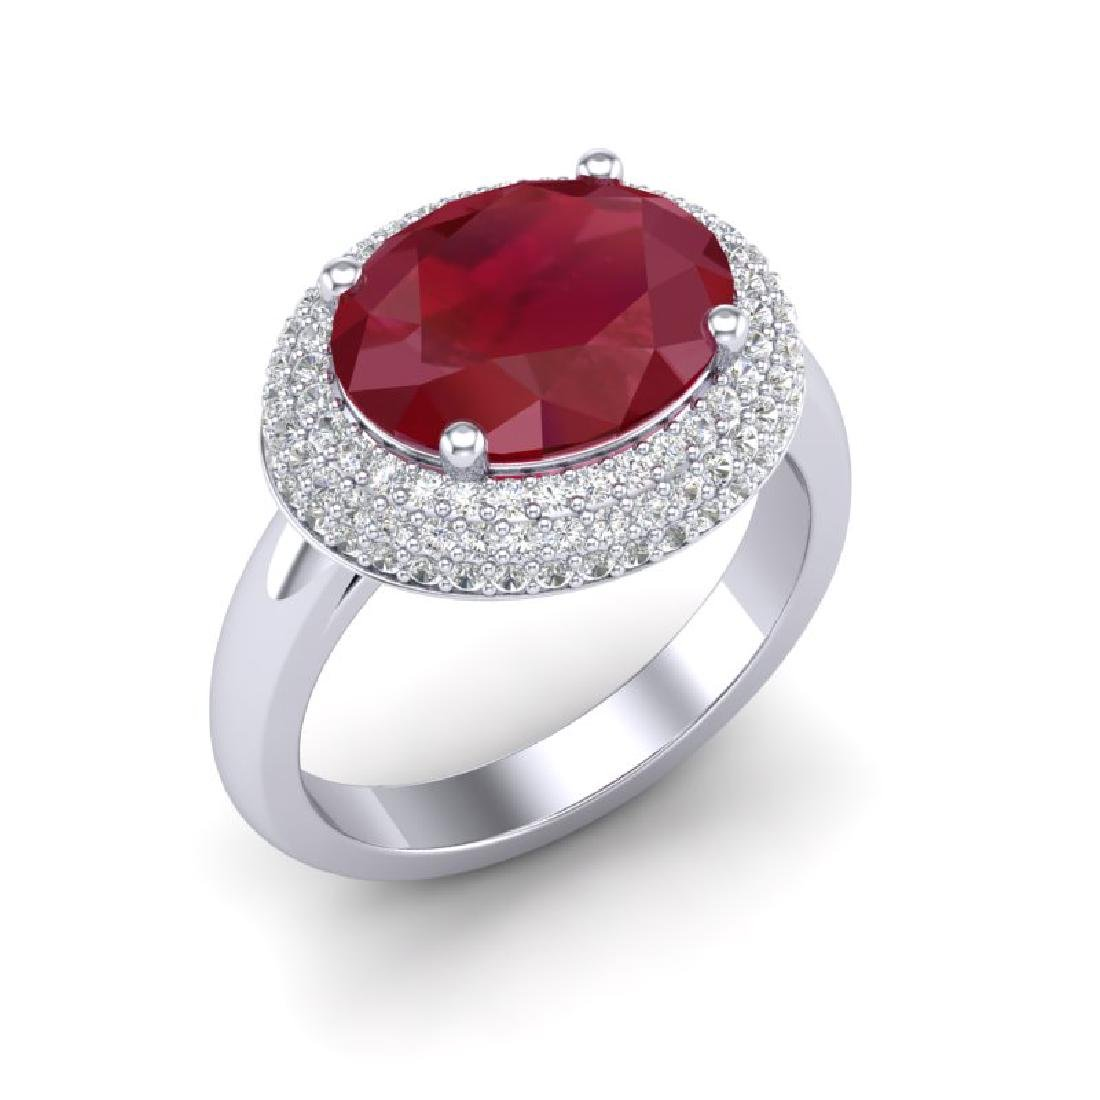 4.50 CTW Ruby & Micro Pave VS/SI Diamond Ring 18K White